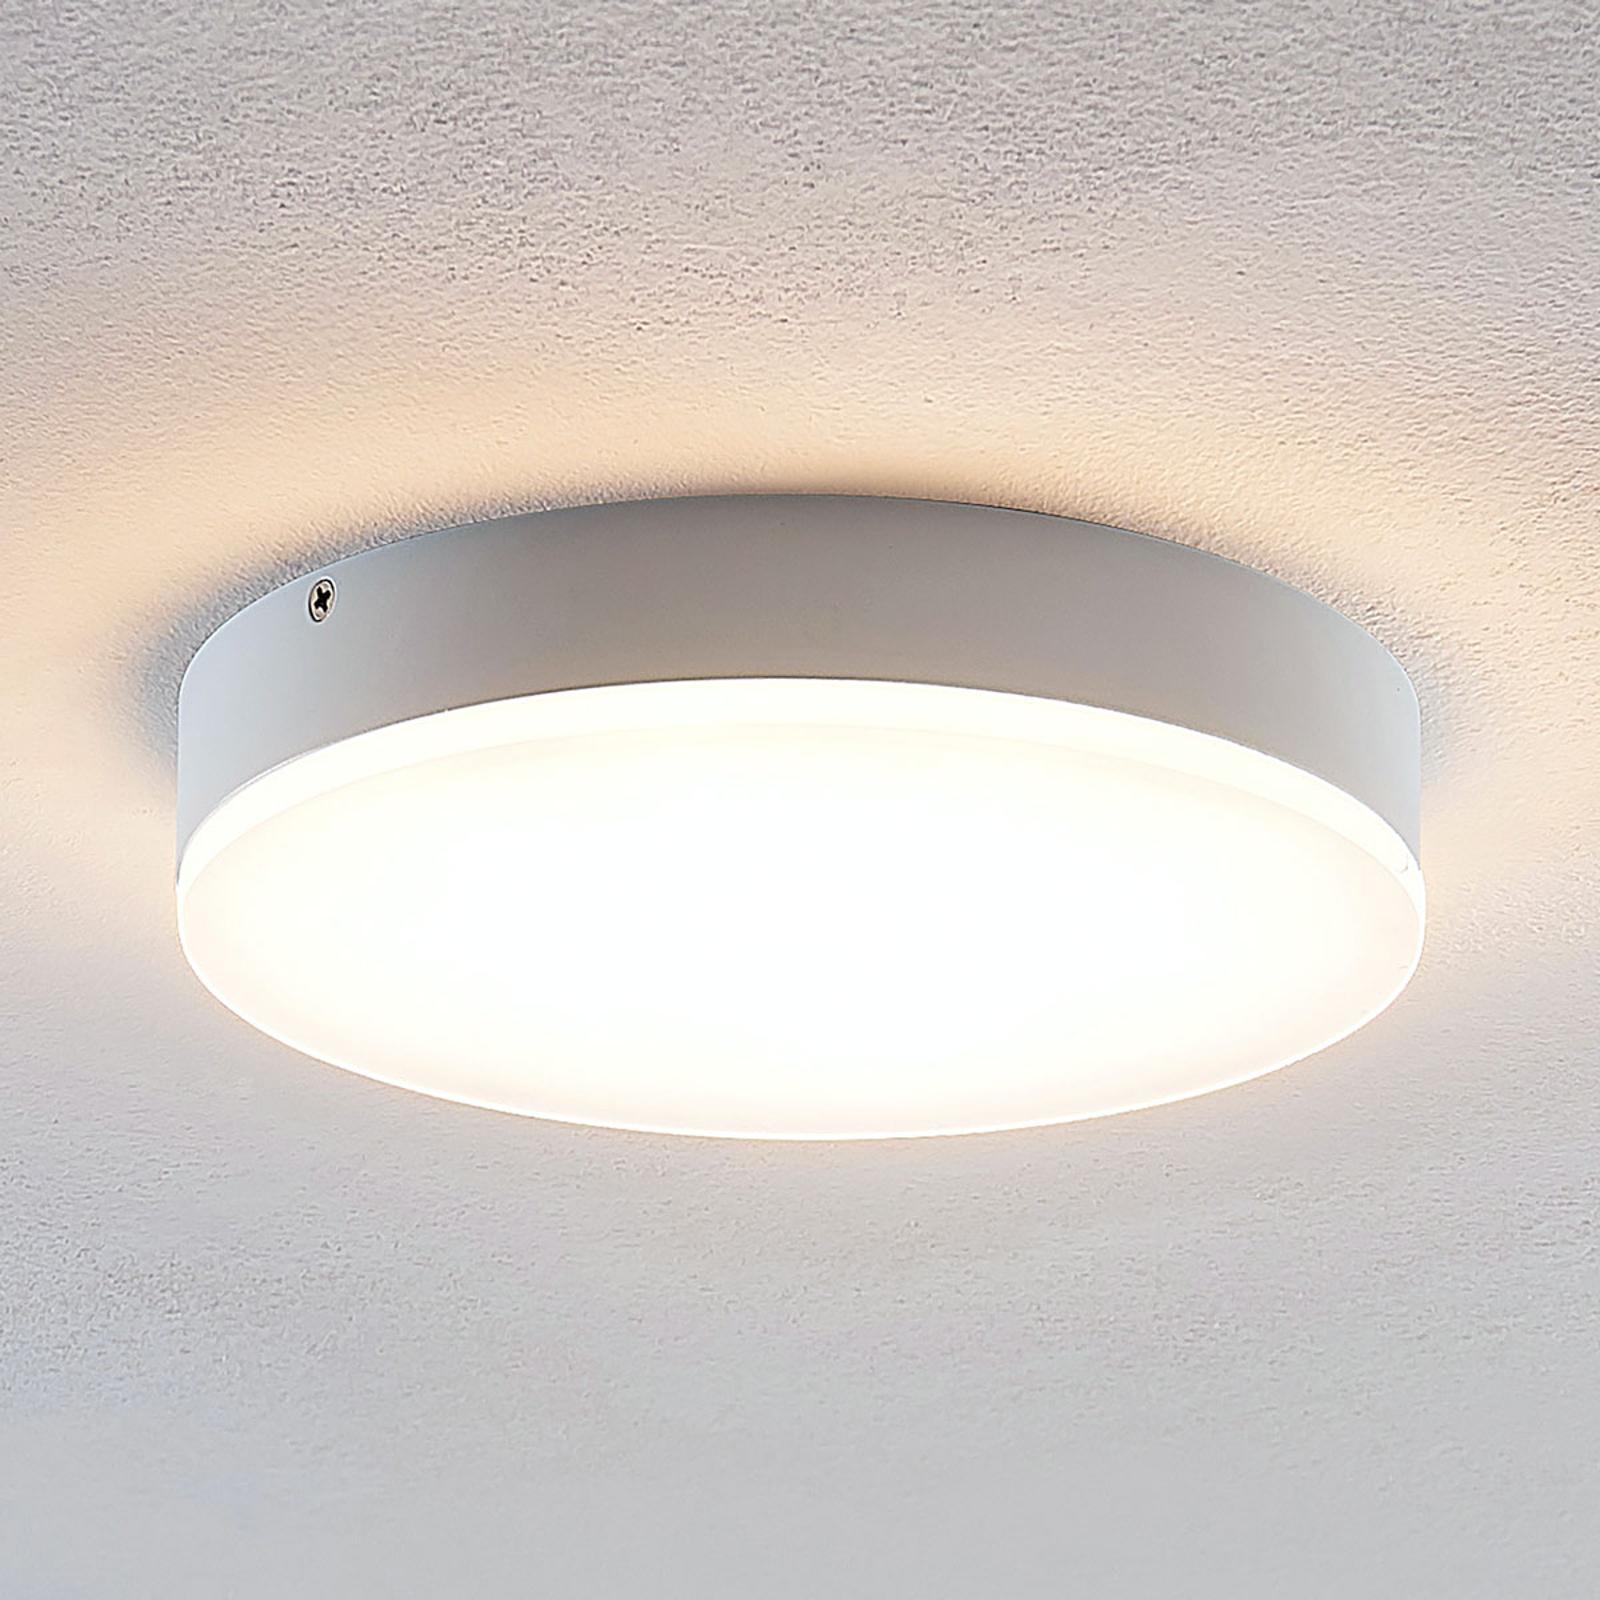 Lindby Leonta LED-kattovalaisin, valkoinen, 20 cm